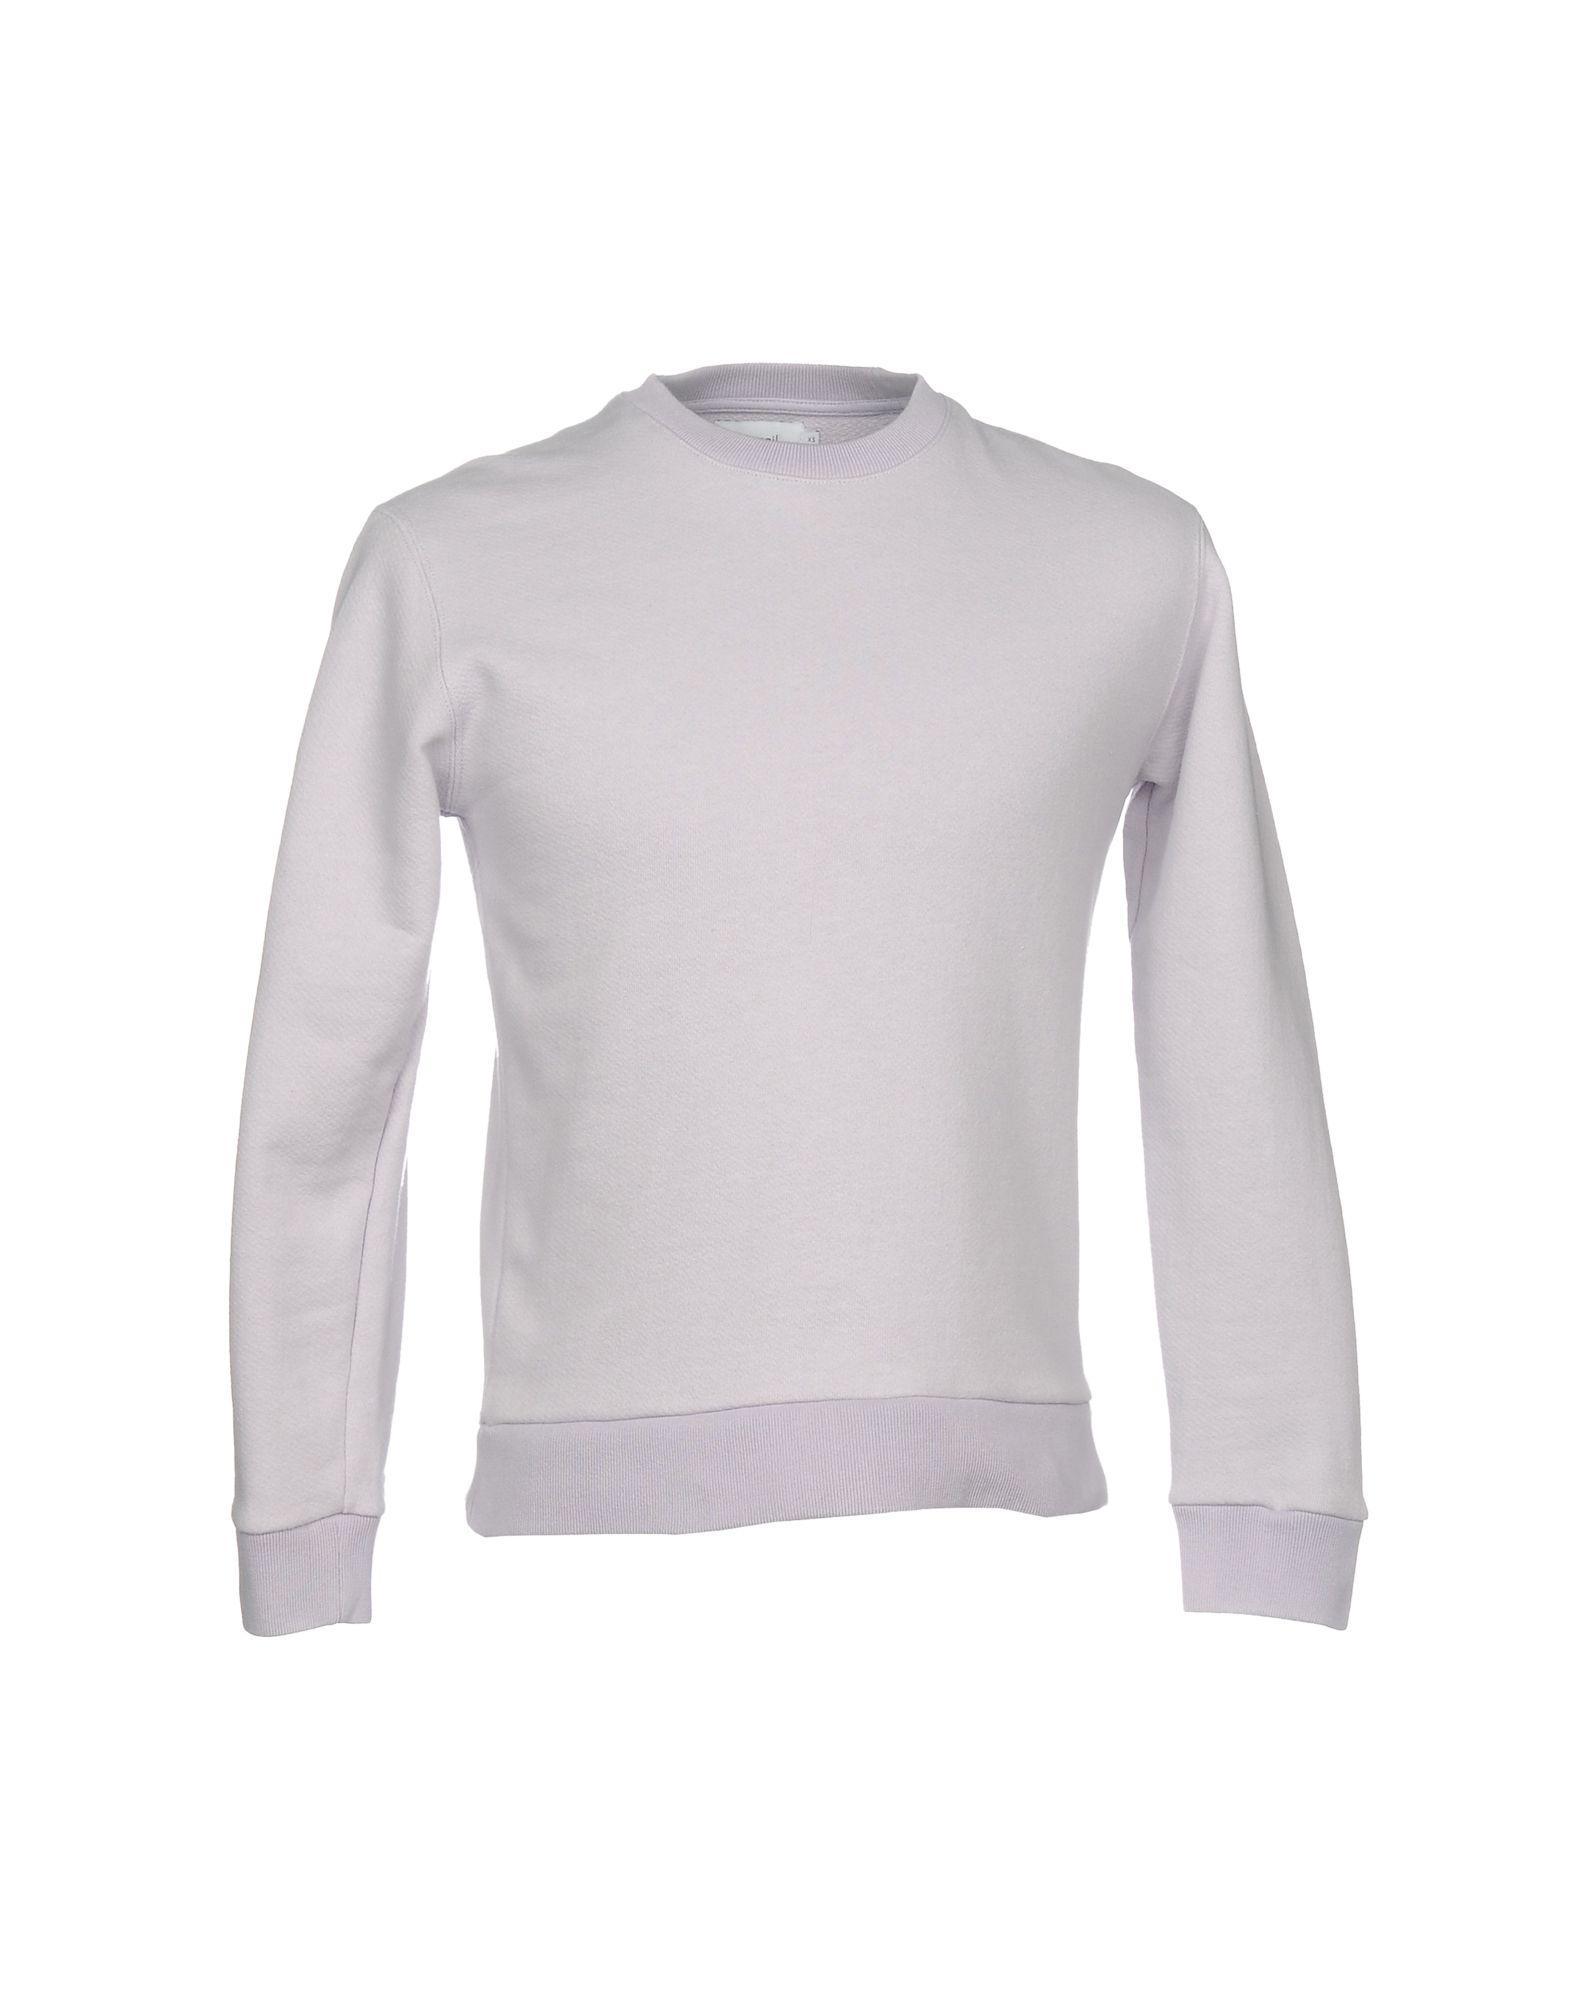 Fanmail Sweatshirt In Lilac